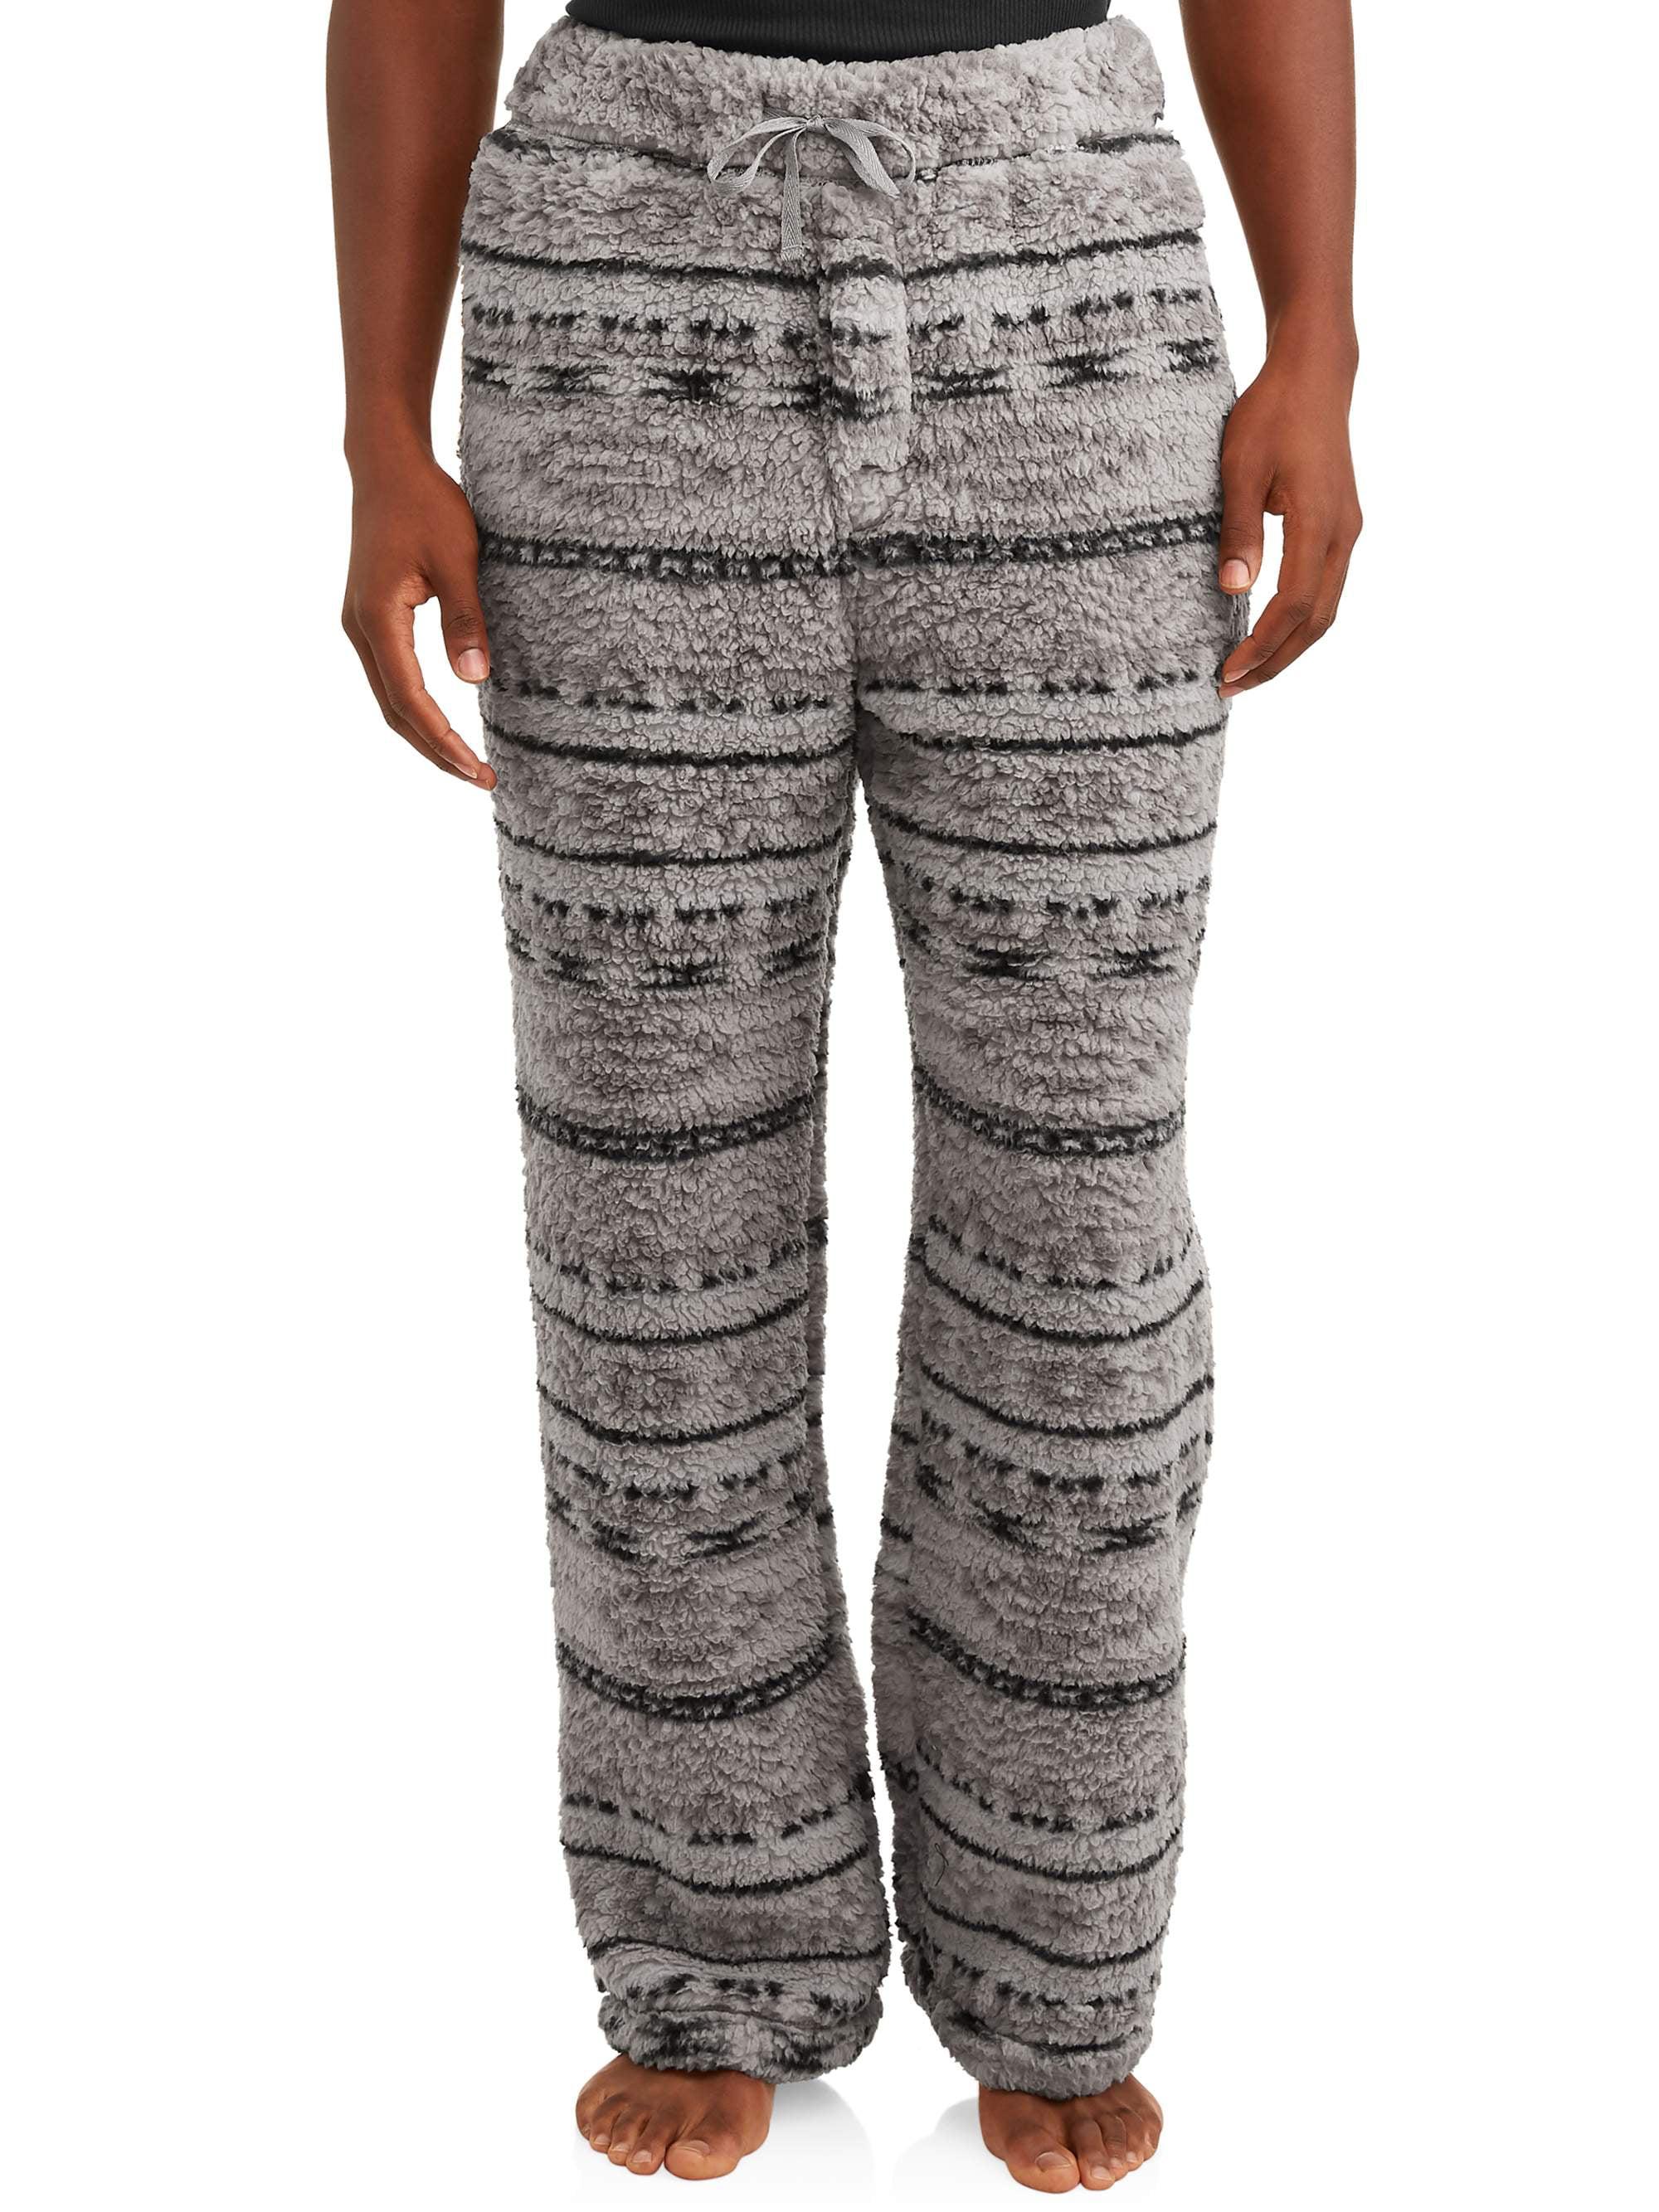 NEW Star Wars movie Lounge Long Pants Sleep Pajamas Bottoms Mens Size M XL